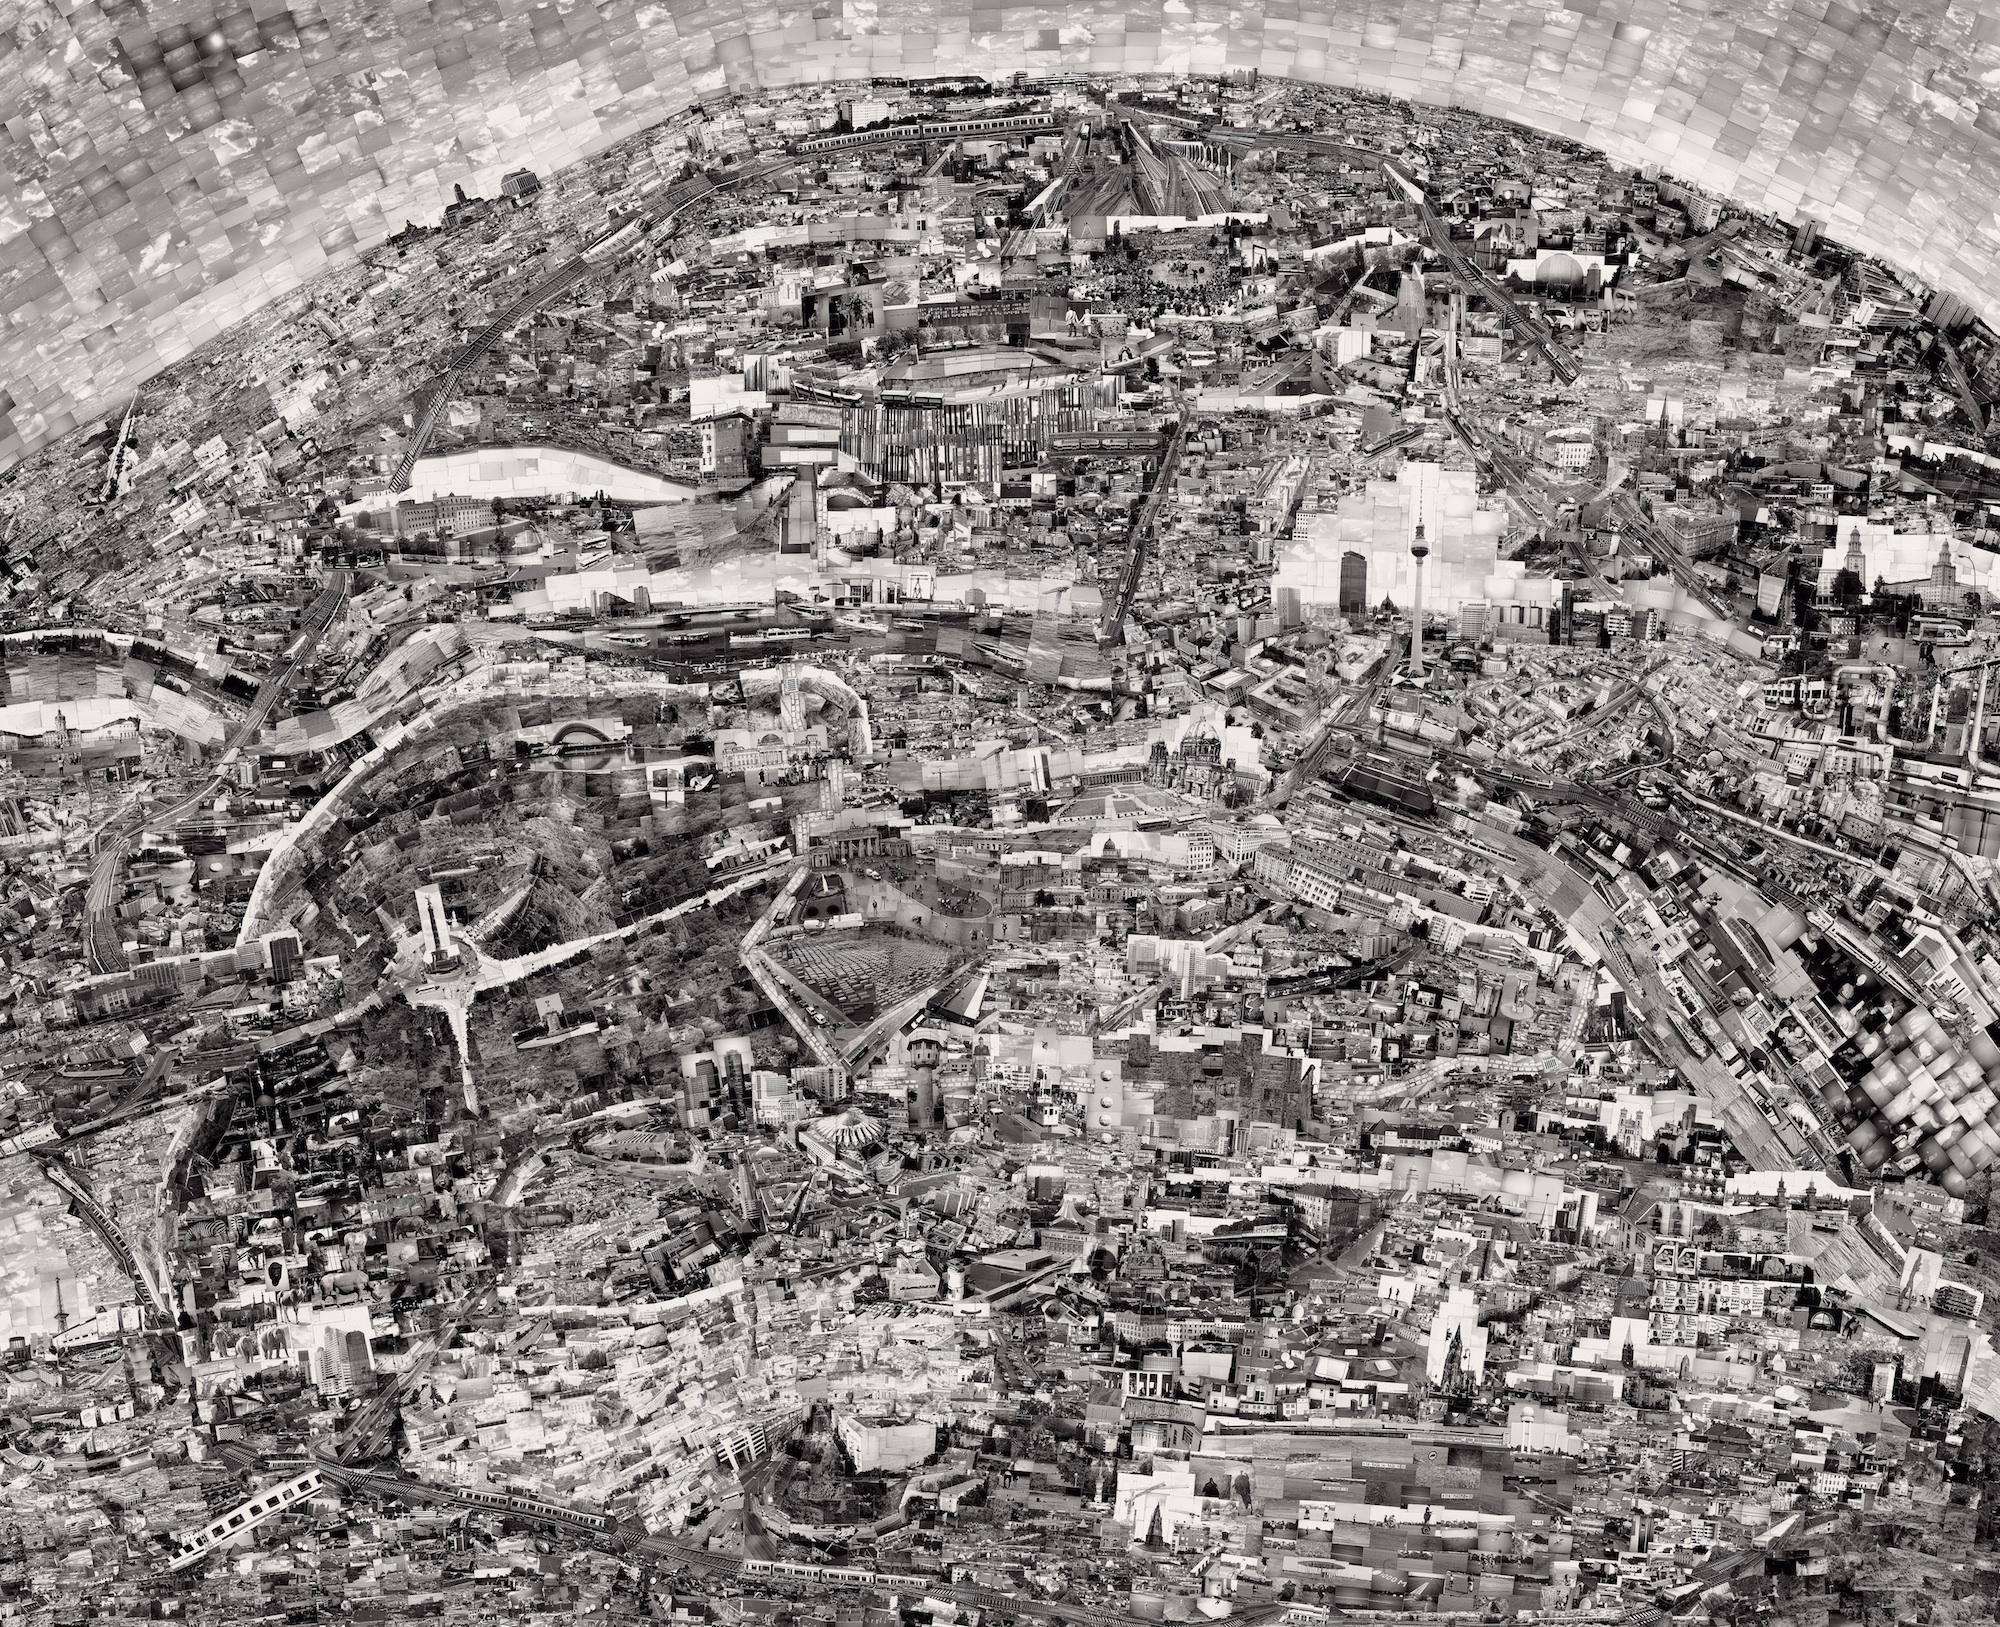 """Diorama Map Berlin"" (2012) by Sohei Nishino (Image courtesy of Michael Hoppen Gallery)"